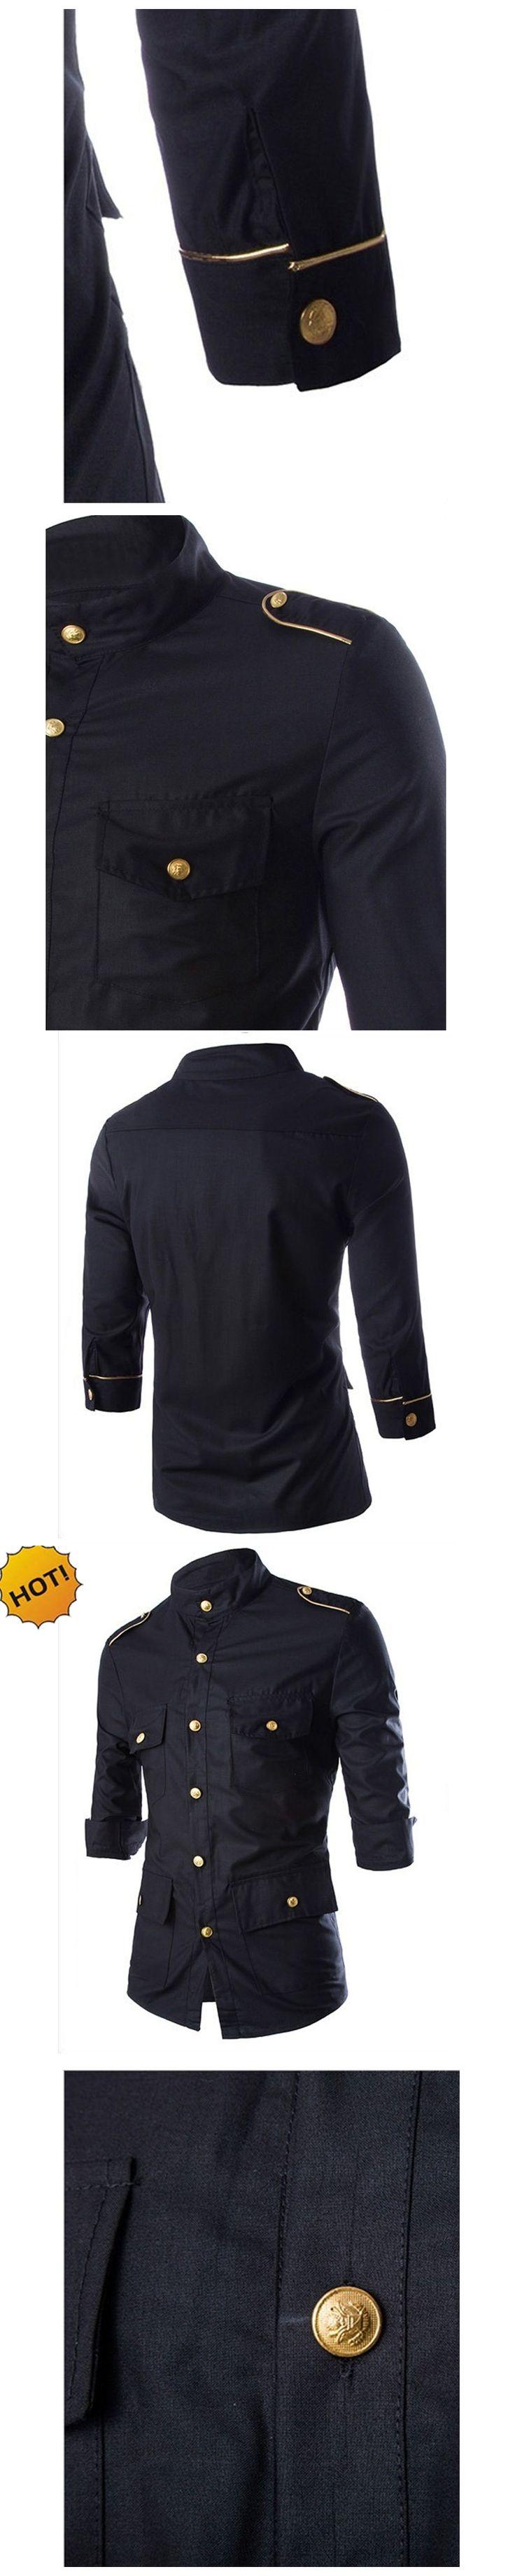 New2017 Fashion Autumn Tuxedo Shirts Gold Button Solid Epaulet three Quarter Sleeve Black Slim Fit Multi-Pocket Dress Shirt